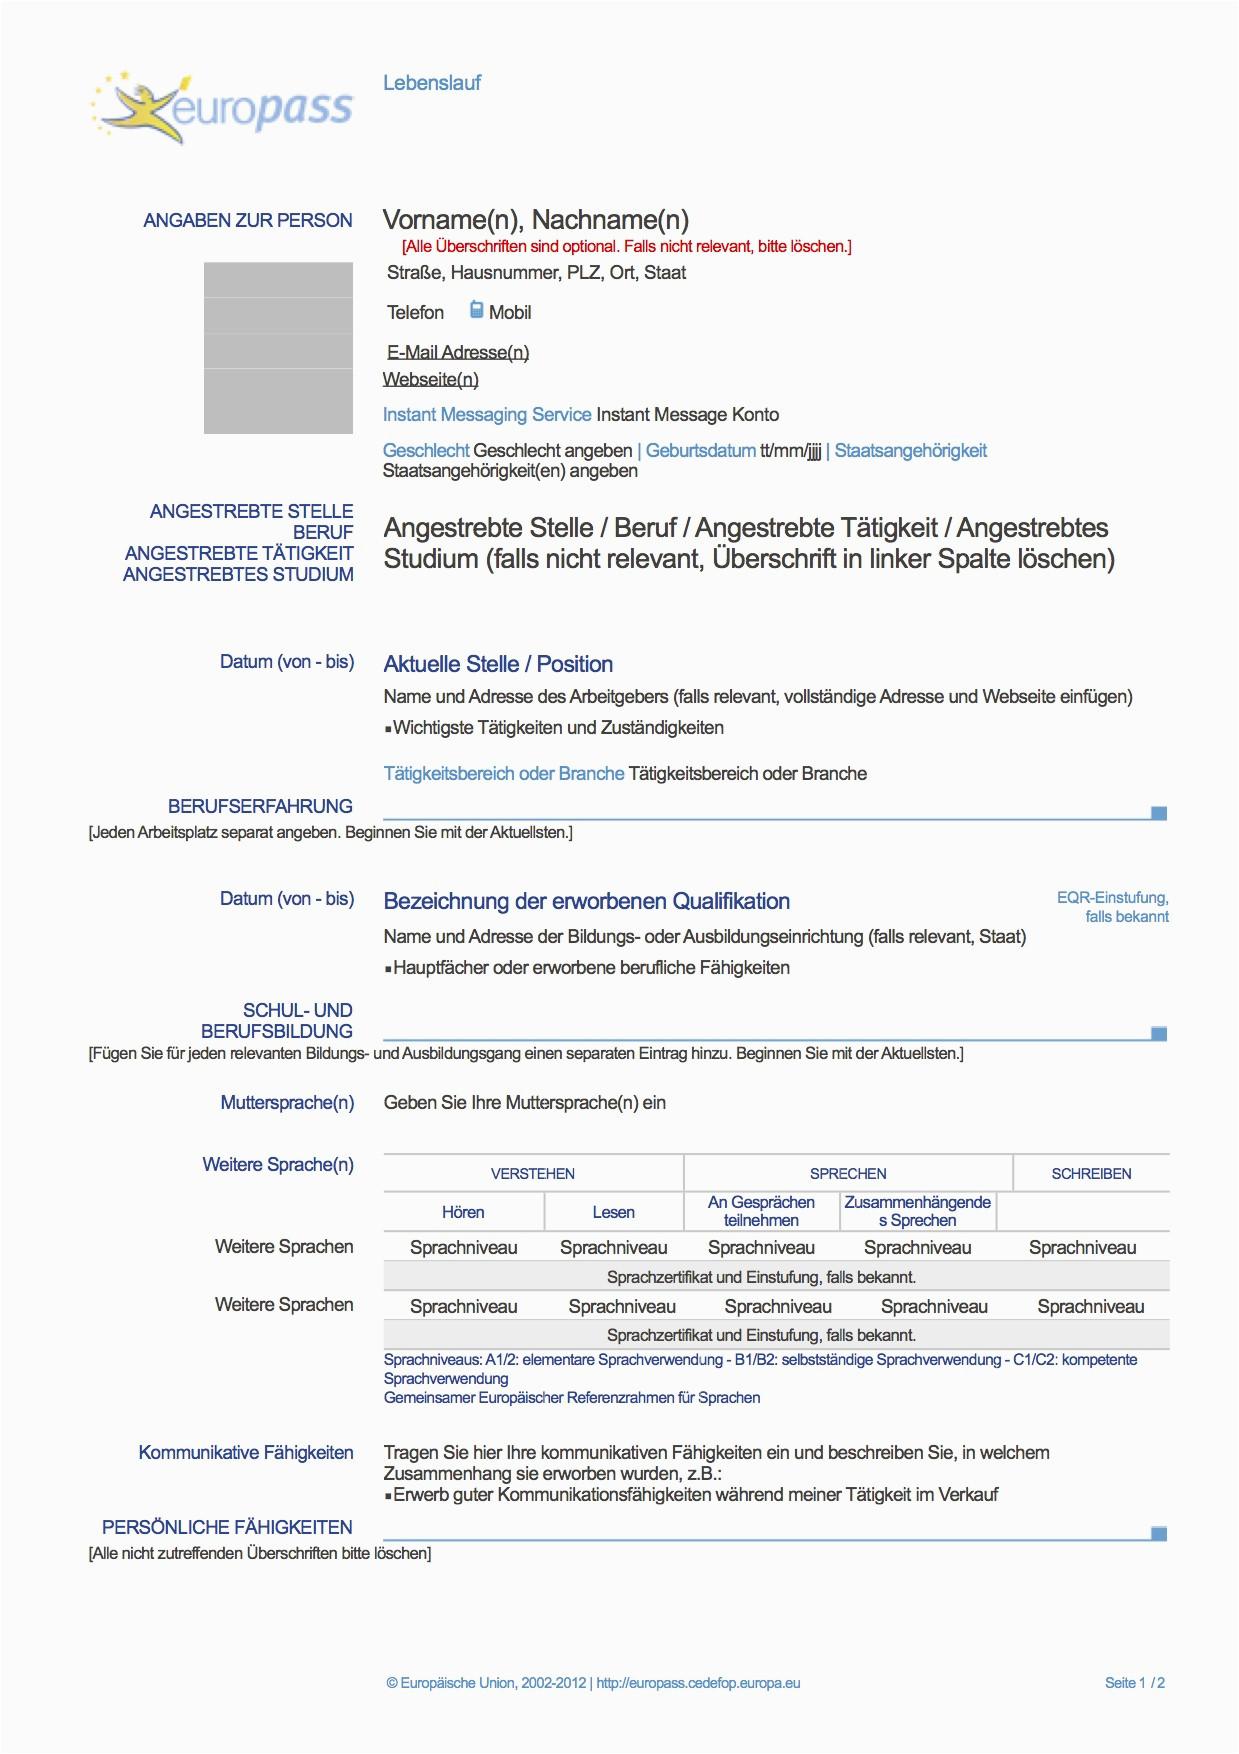 Europass Lebenslauf Deutsch Download Europass Lebenslauf Deutsch Muster Lebenslauf